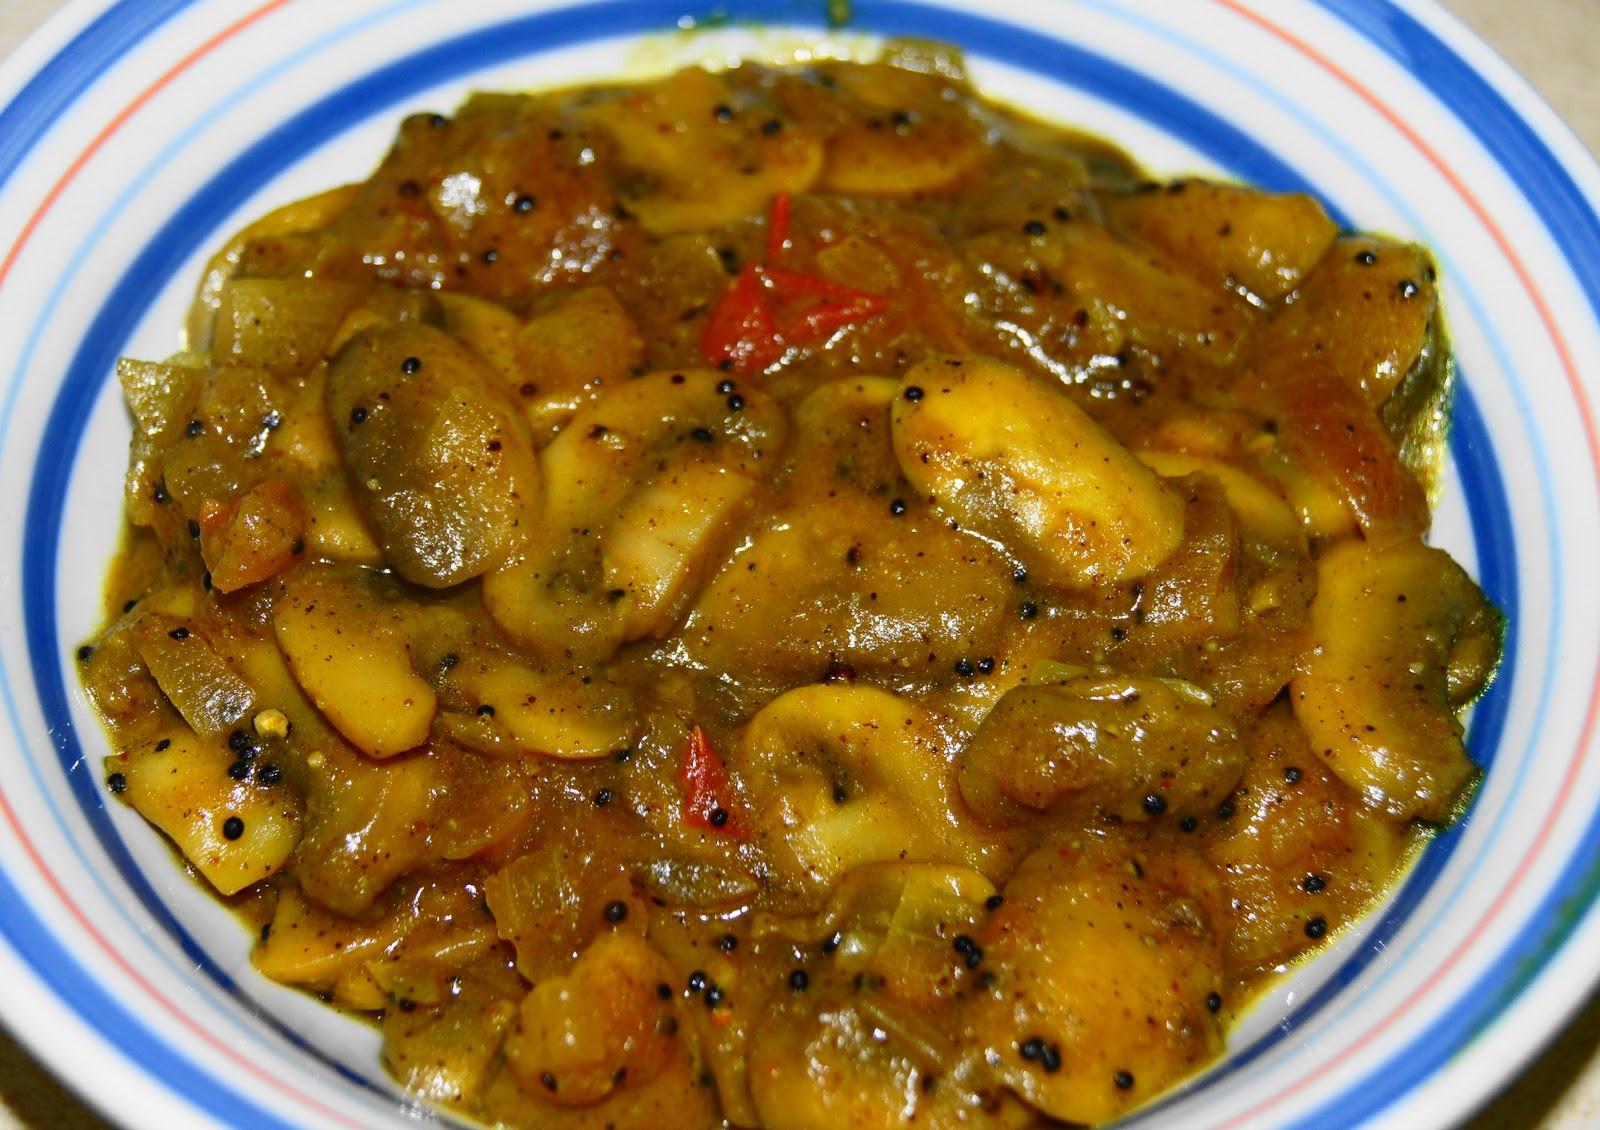 Mushroom Recipes Vegetarian  Simple Ve arian Recipes Mushroom Chettinad